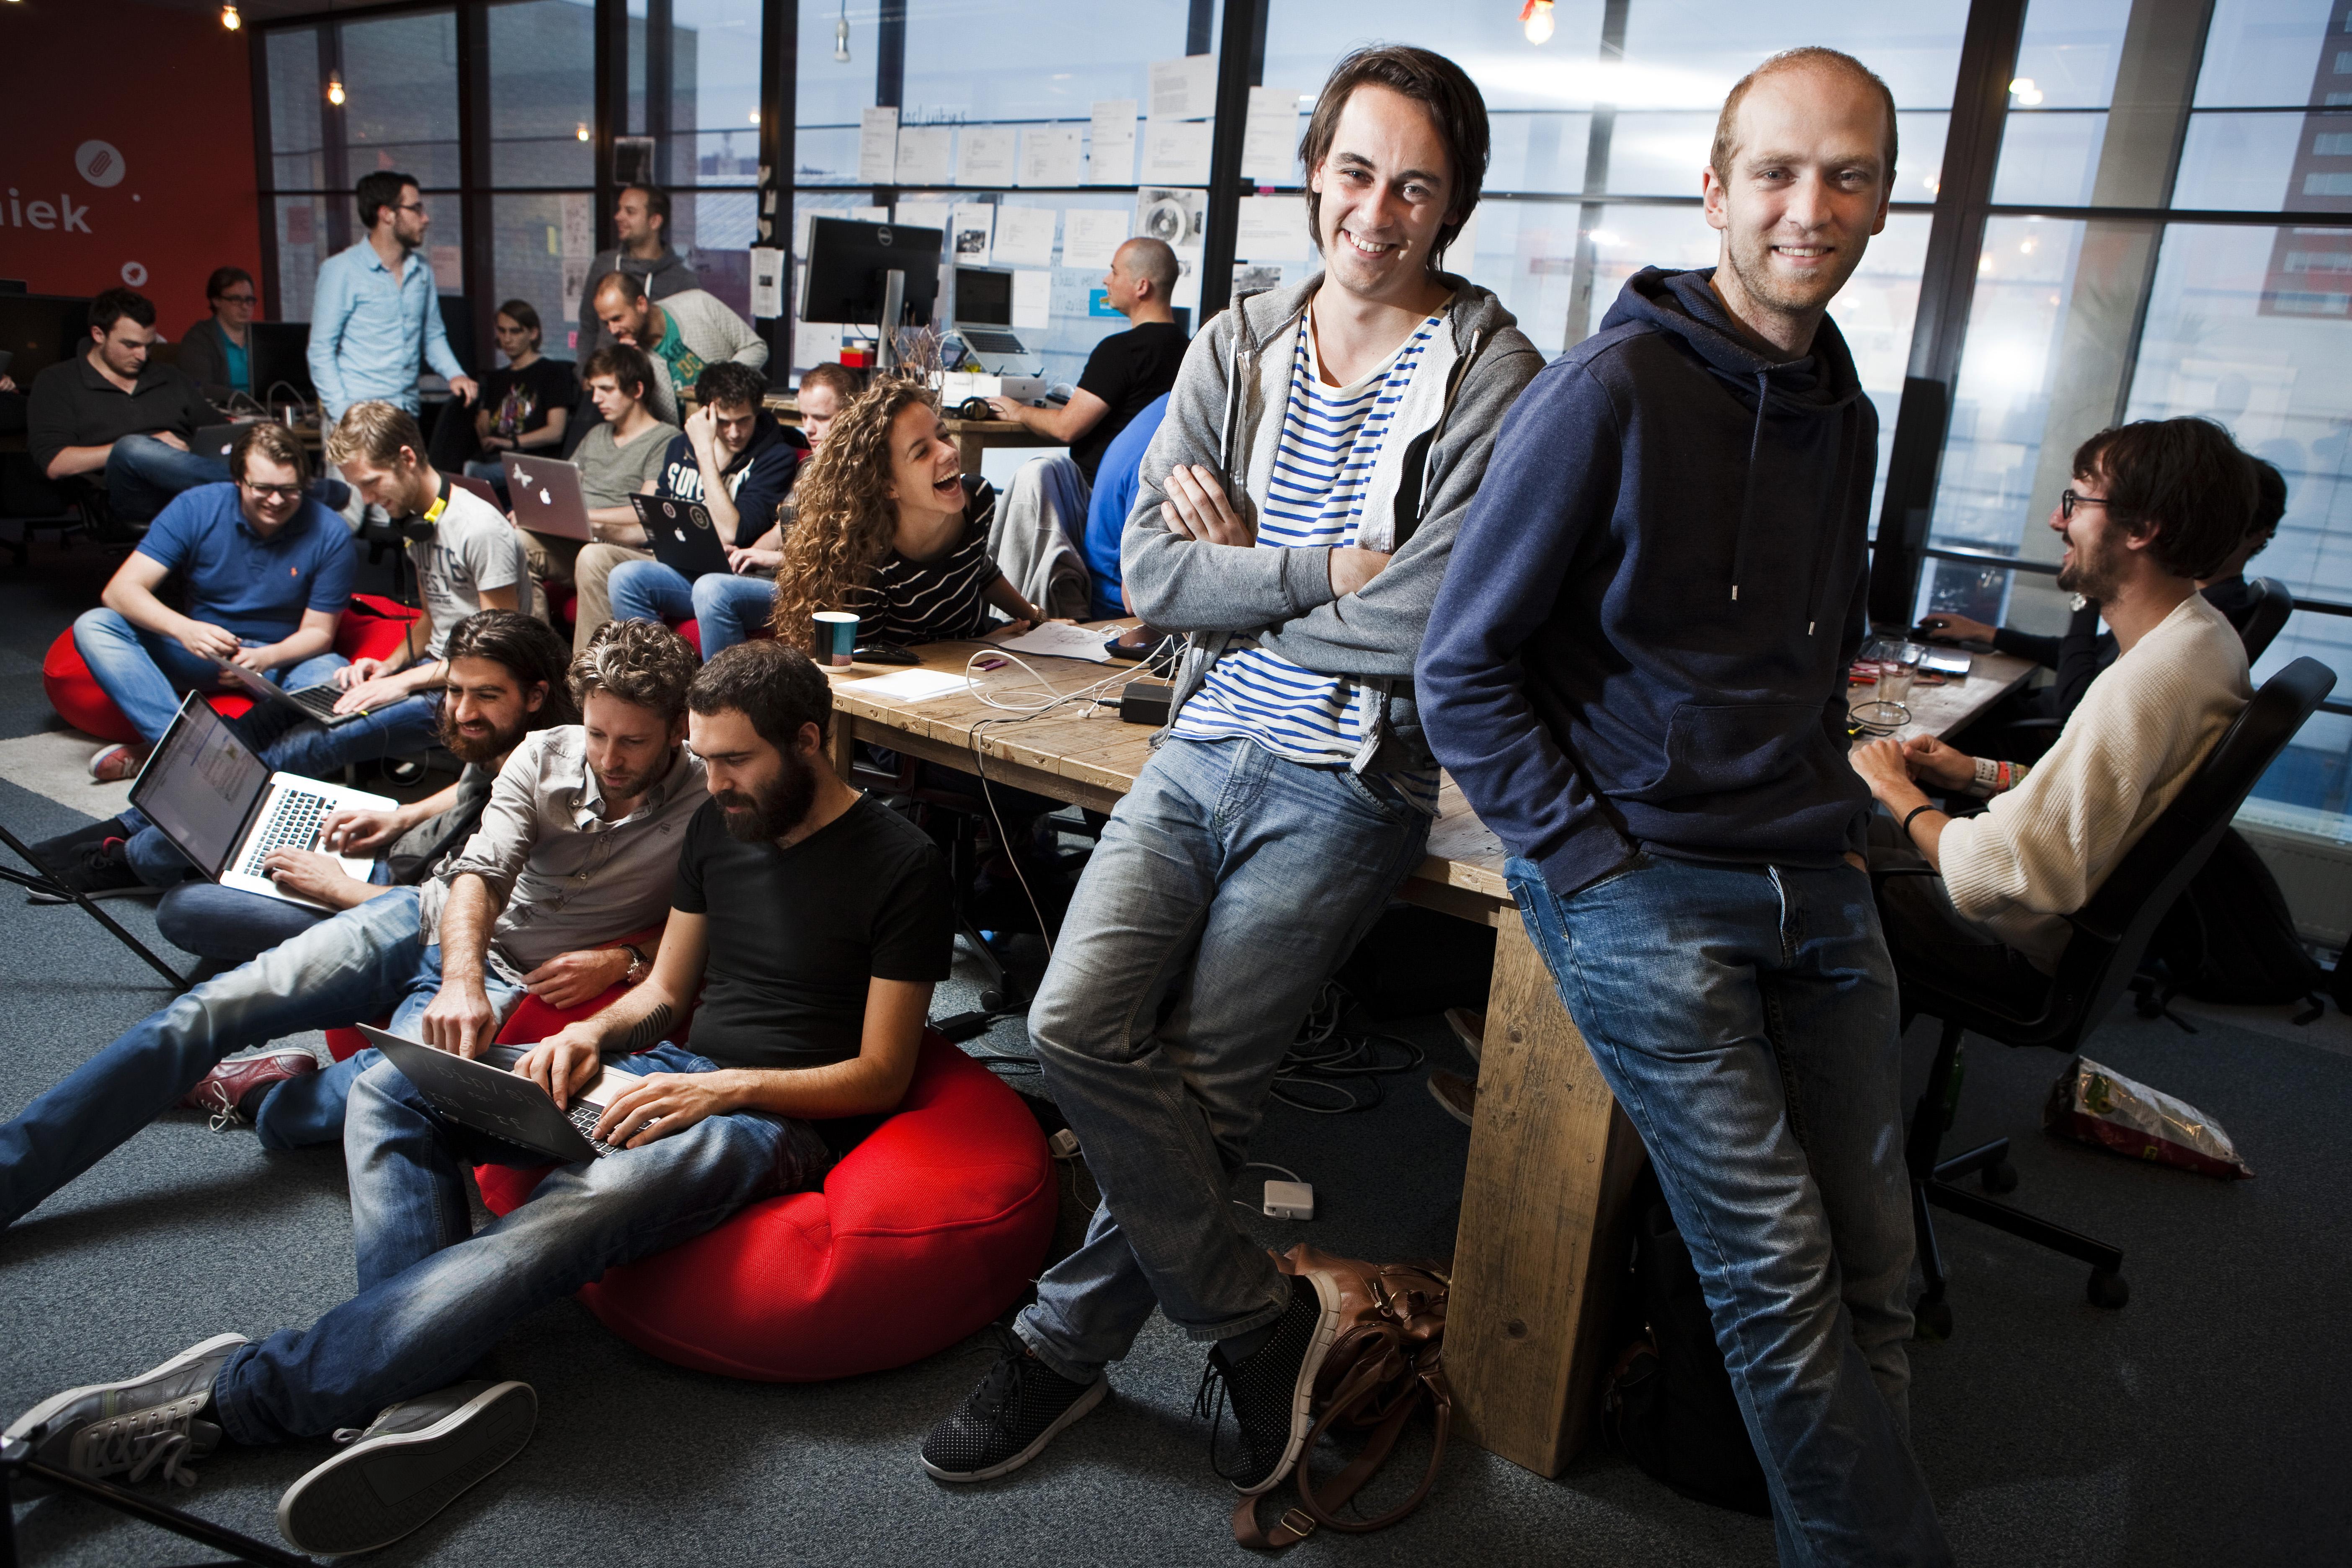 Blendle co-founders Alexander Klopping and Martin Blankesteijn at Blendle's office in Utrecht